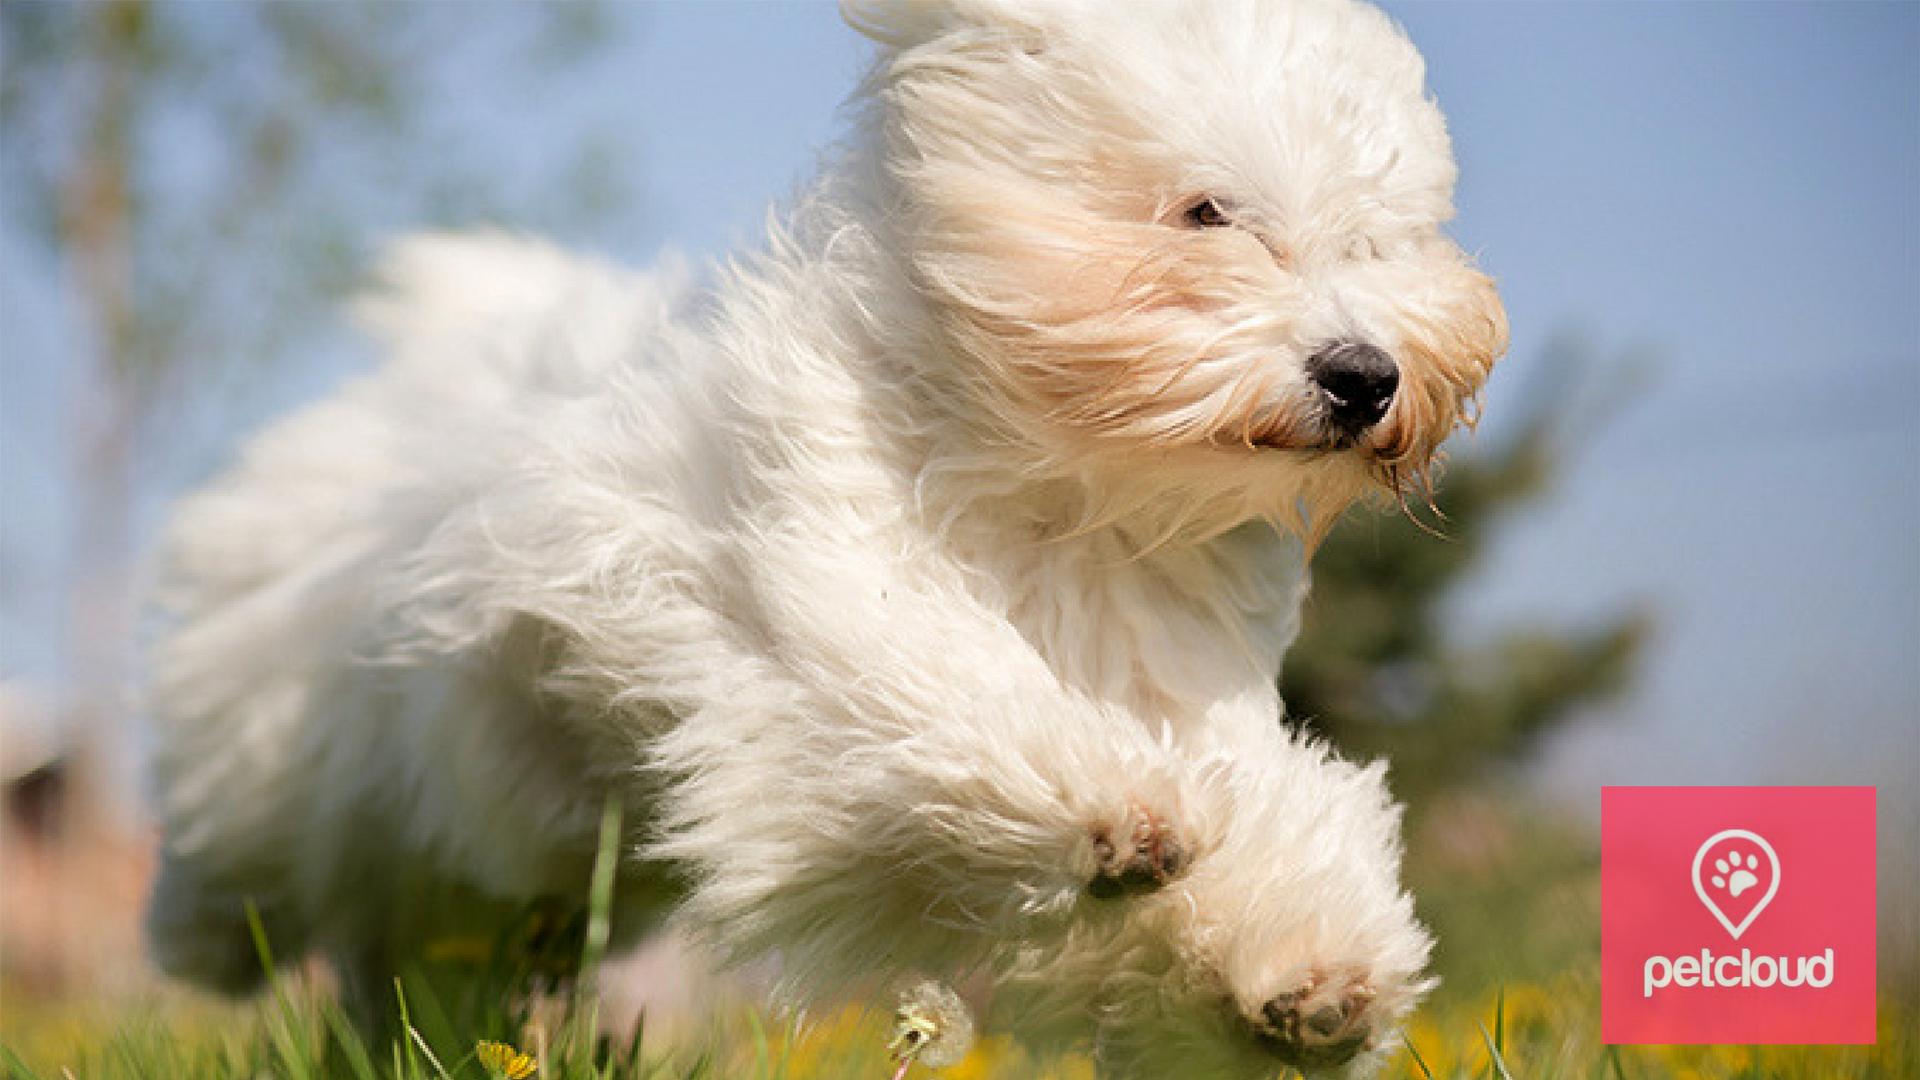 PetCloud, Dog Boarding, Dog Sitting, Christmas, Coton De Tulear, Small Dog